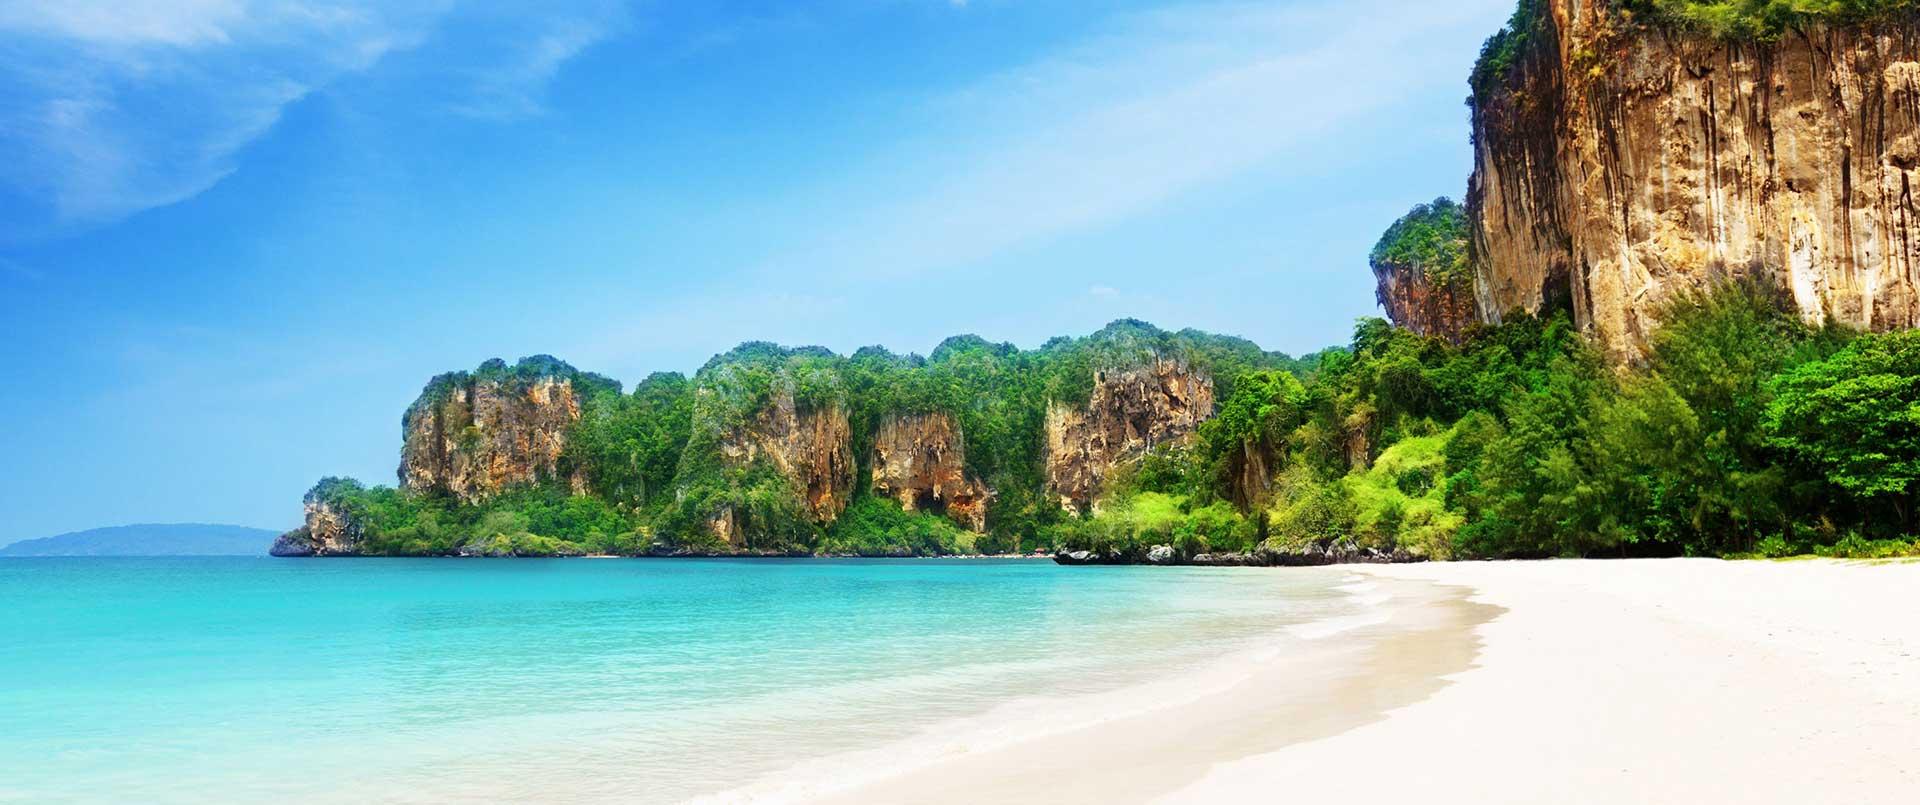 Laos, Cambodia and Thailand Honeymoon